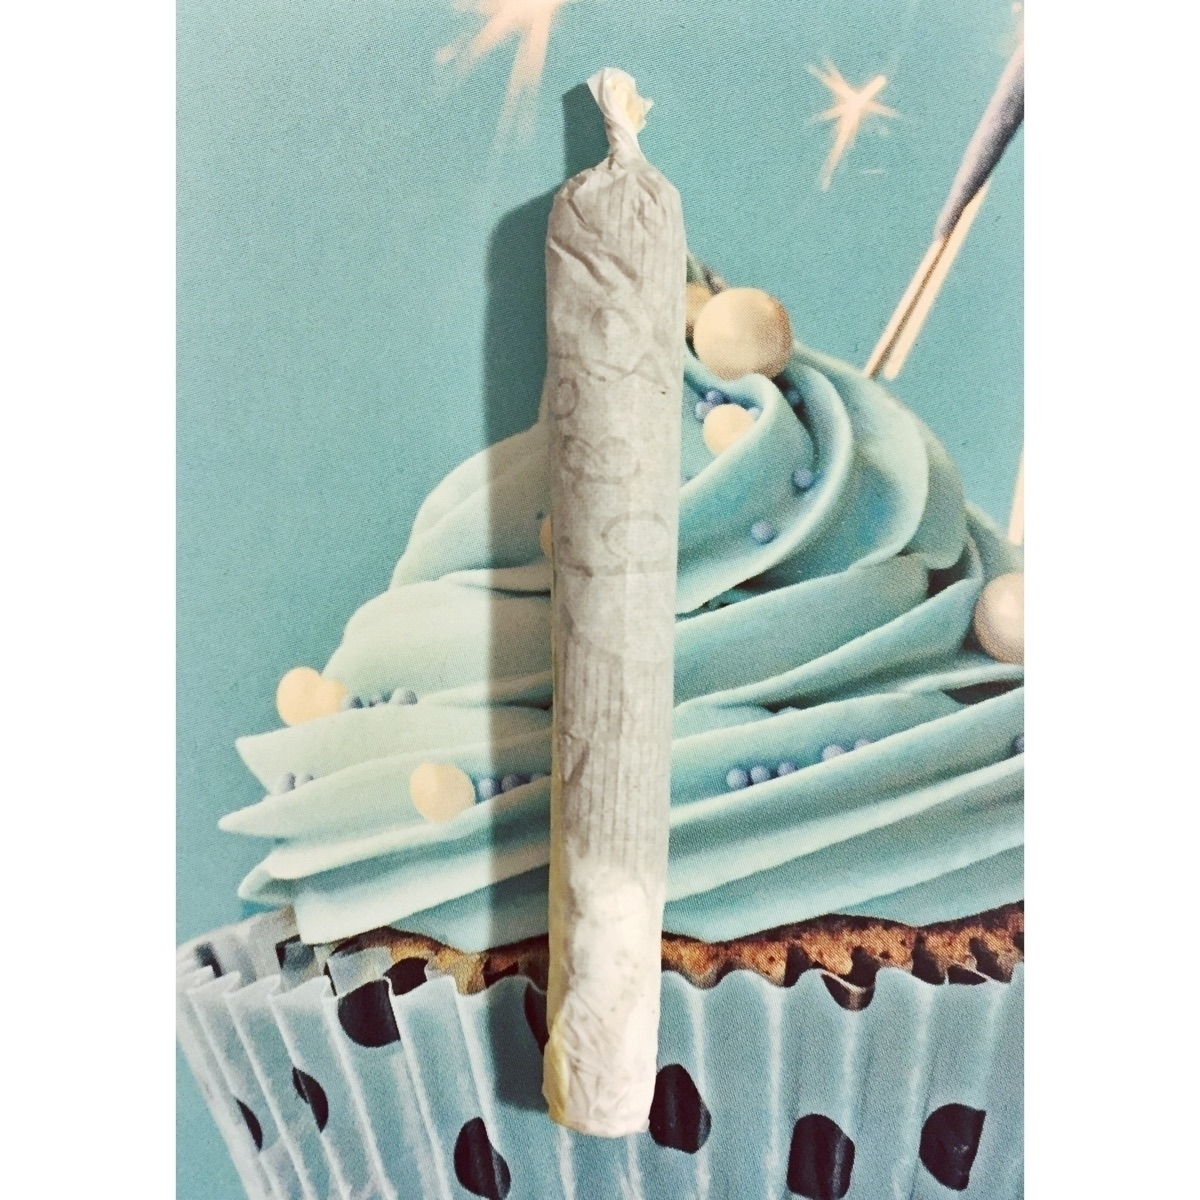 Portrait - cannabis, weedart, pot - jphoto_project   ello